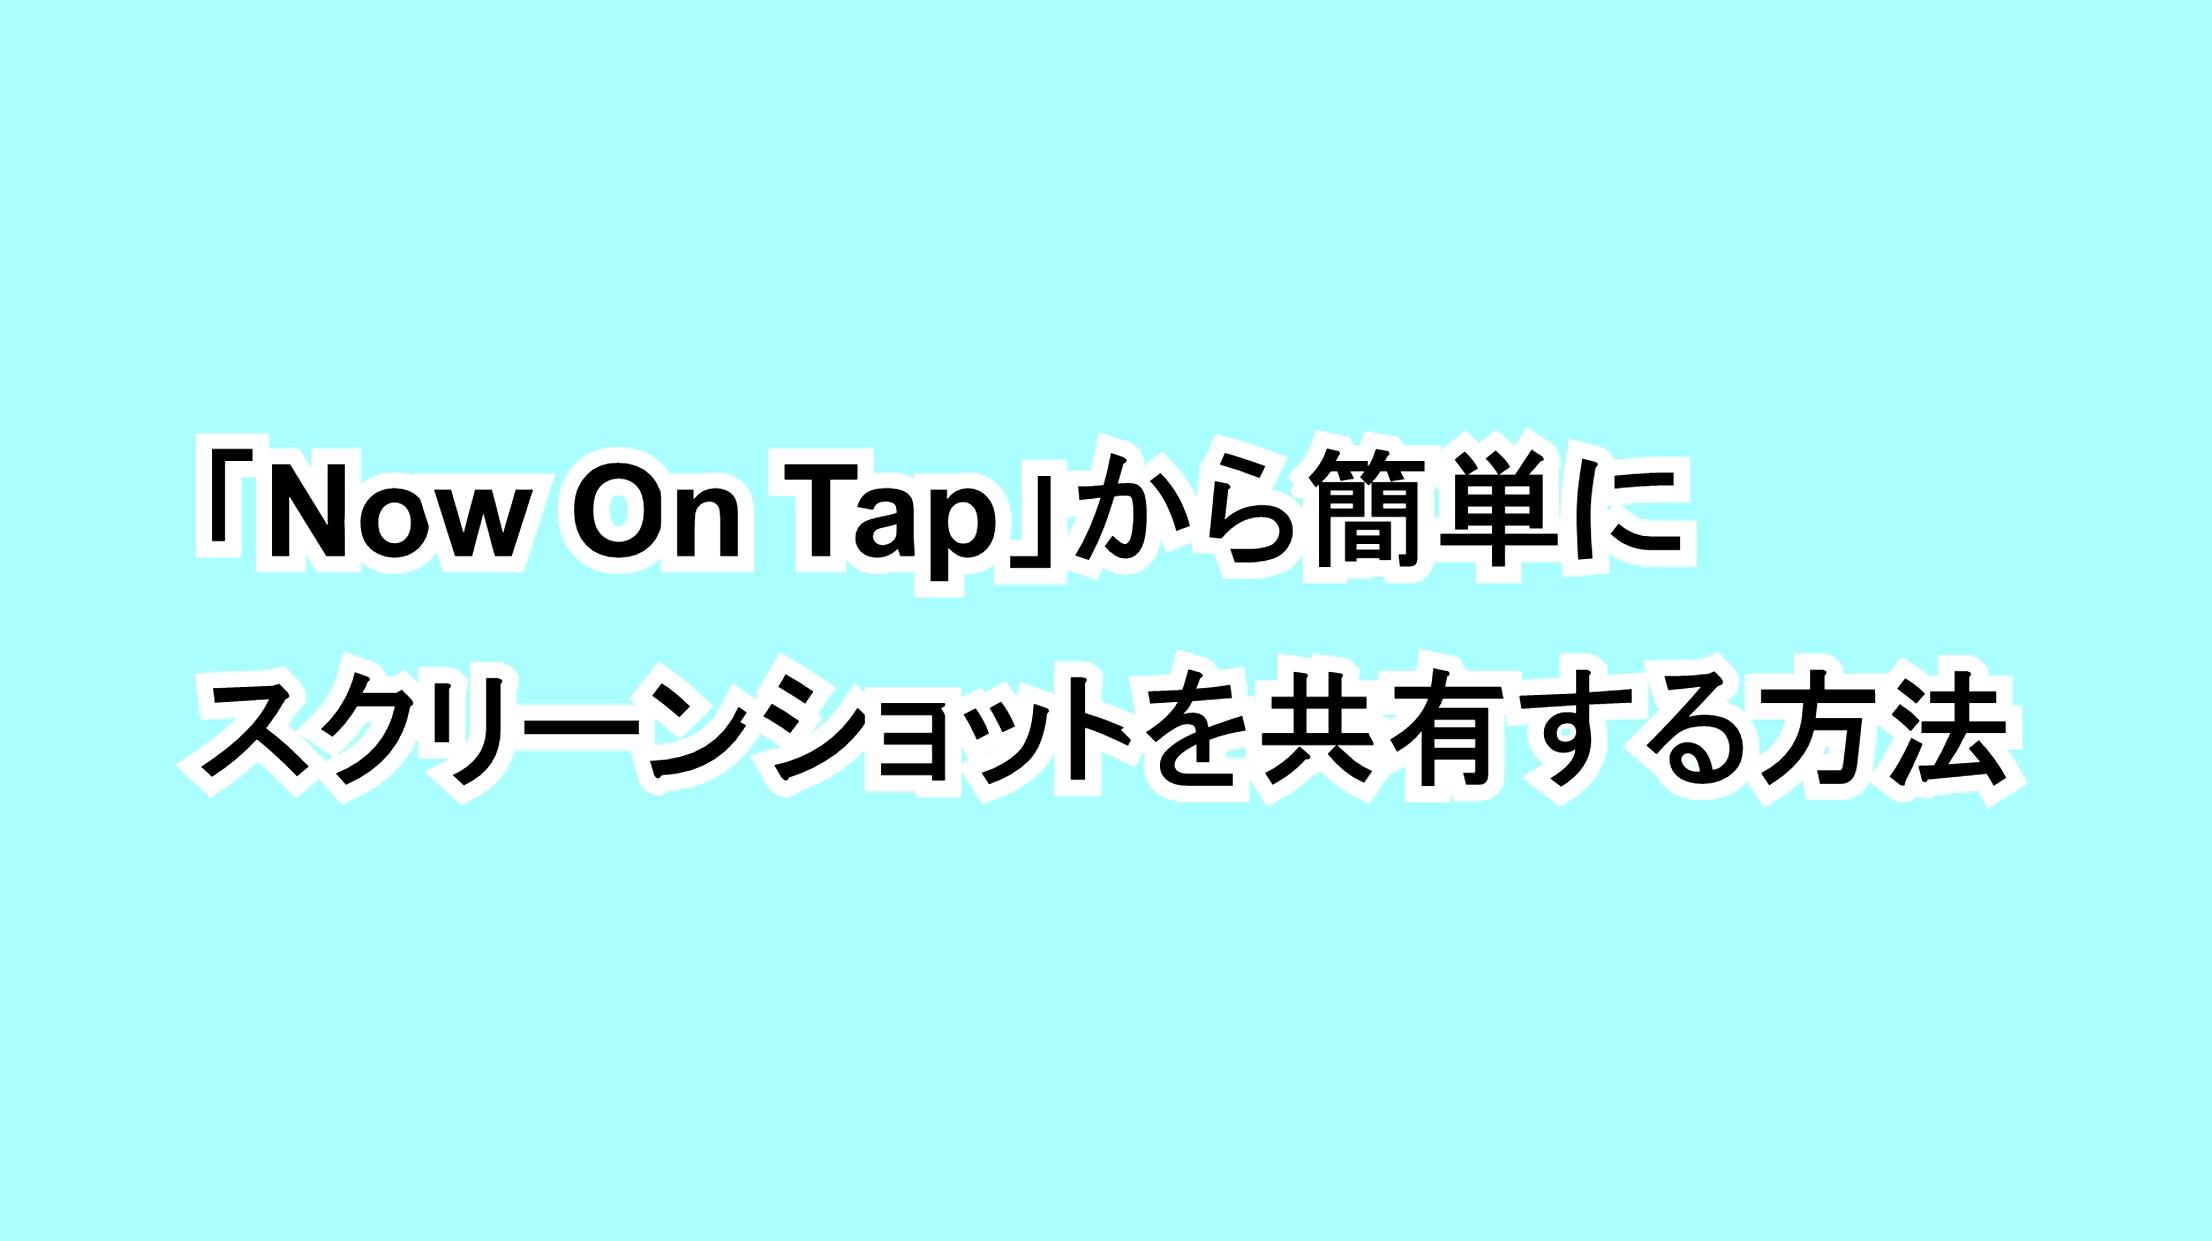 「Now On Tap」から簡単にスクリーンショットを共有する方法